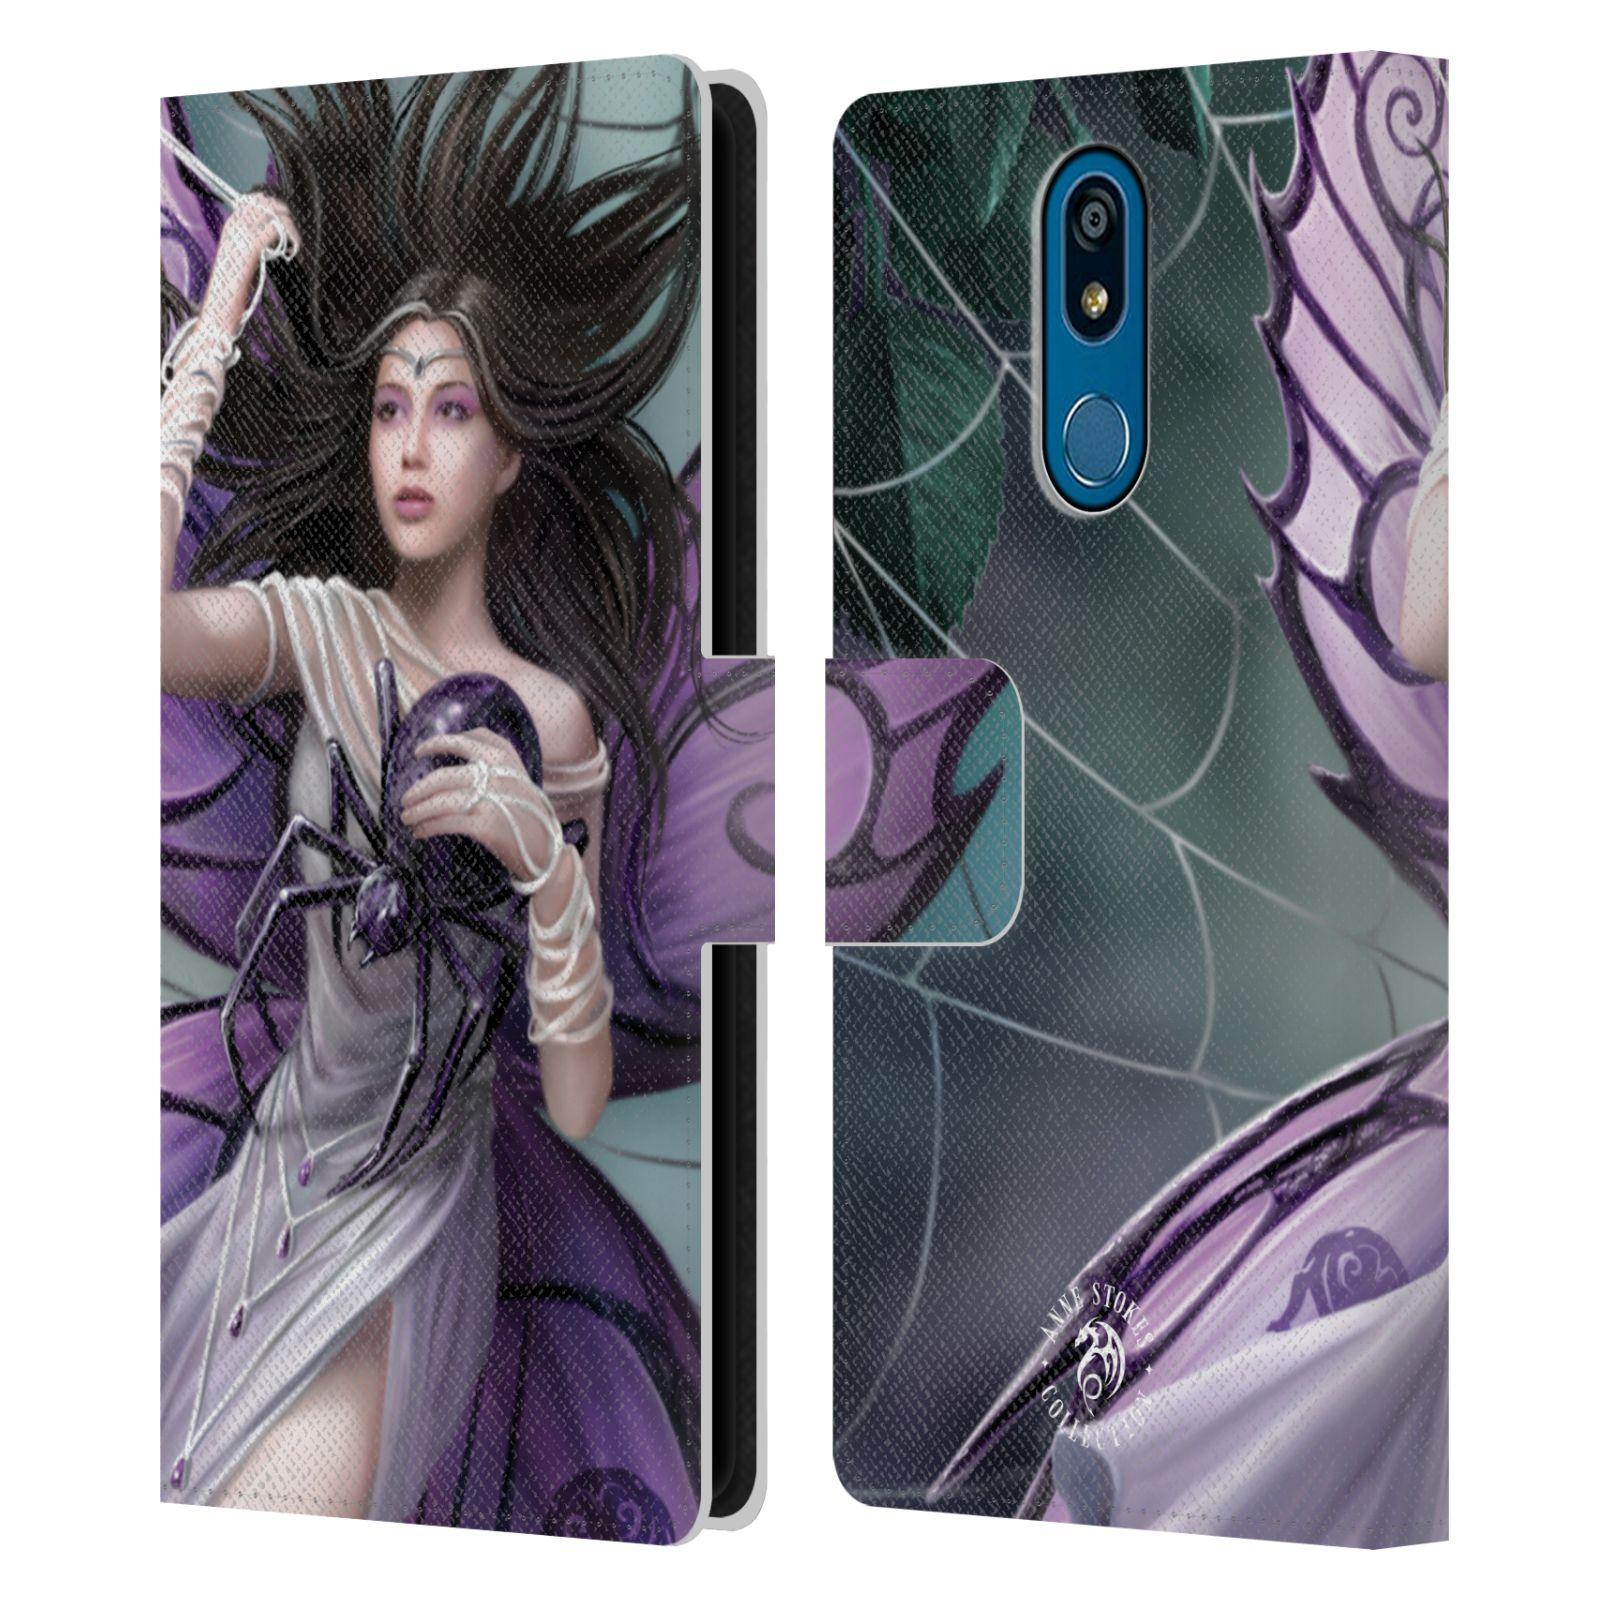 Pouzdro na mobil LG K40 - Head Case - fantasy - žena svůdnice